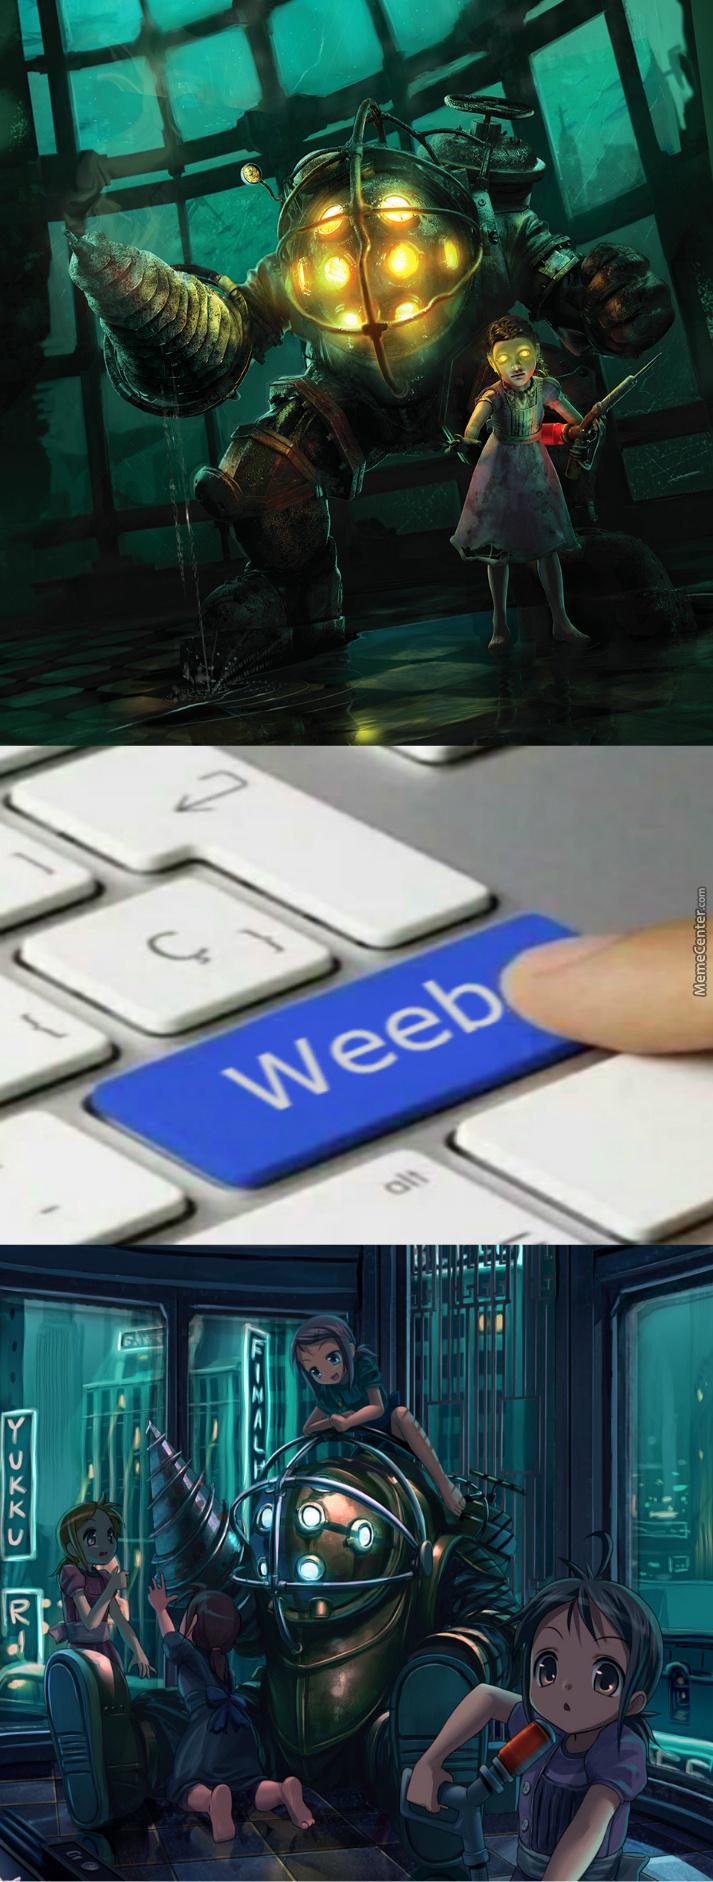 Weeb-o-shock